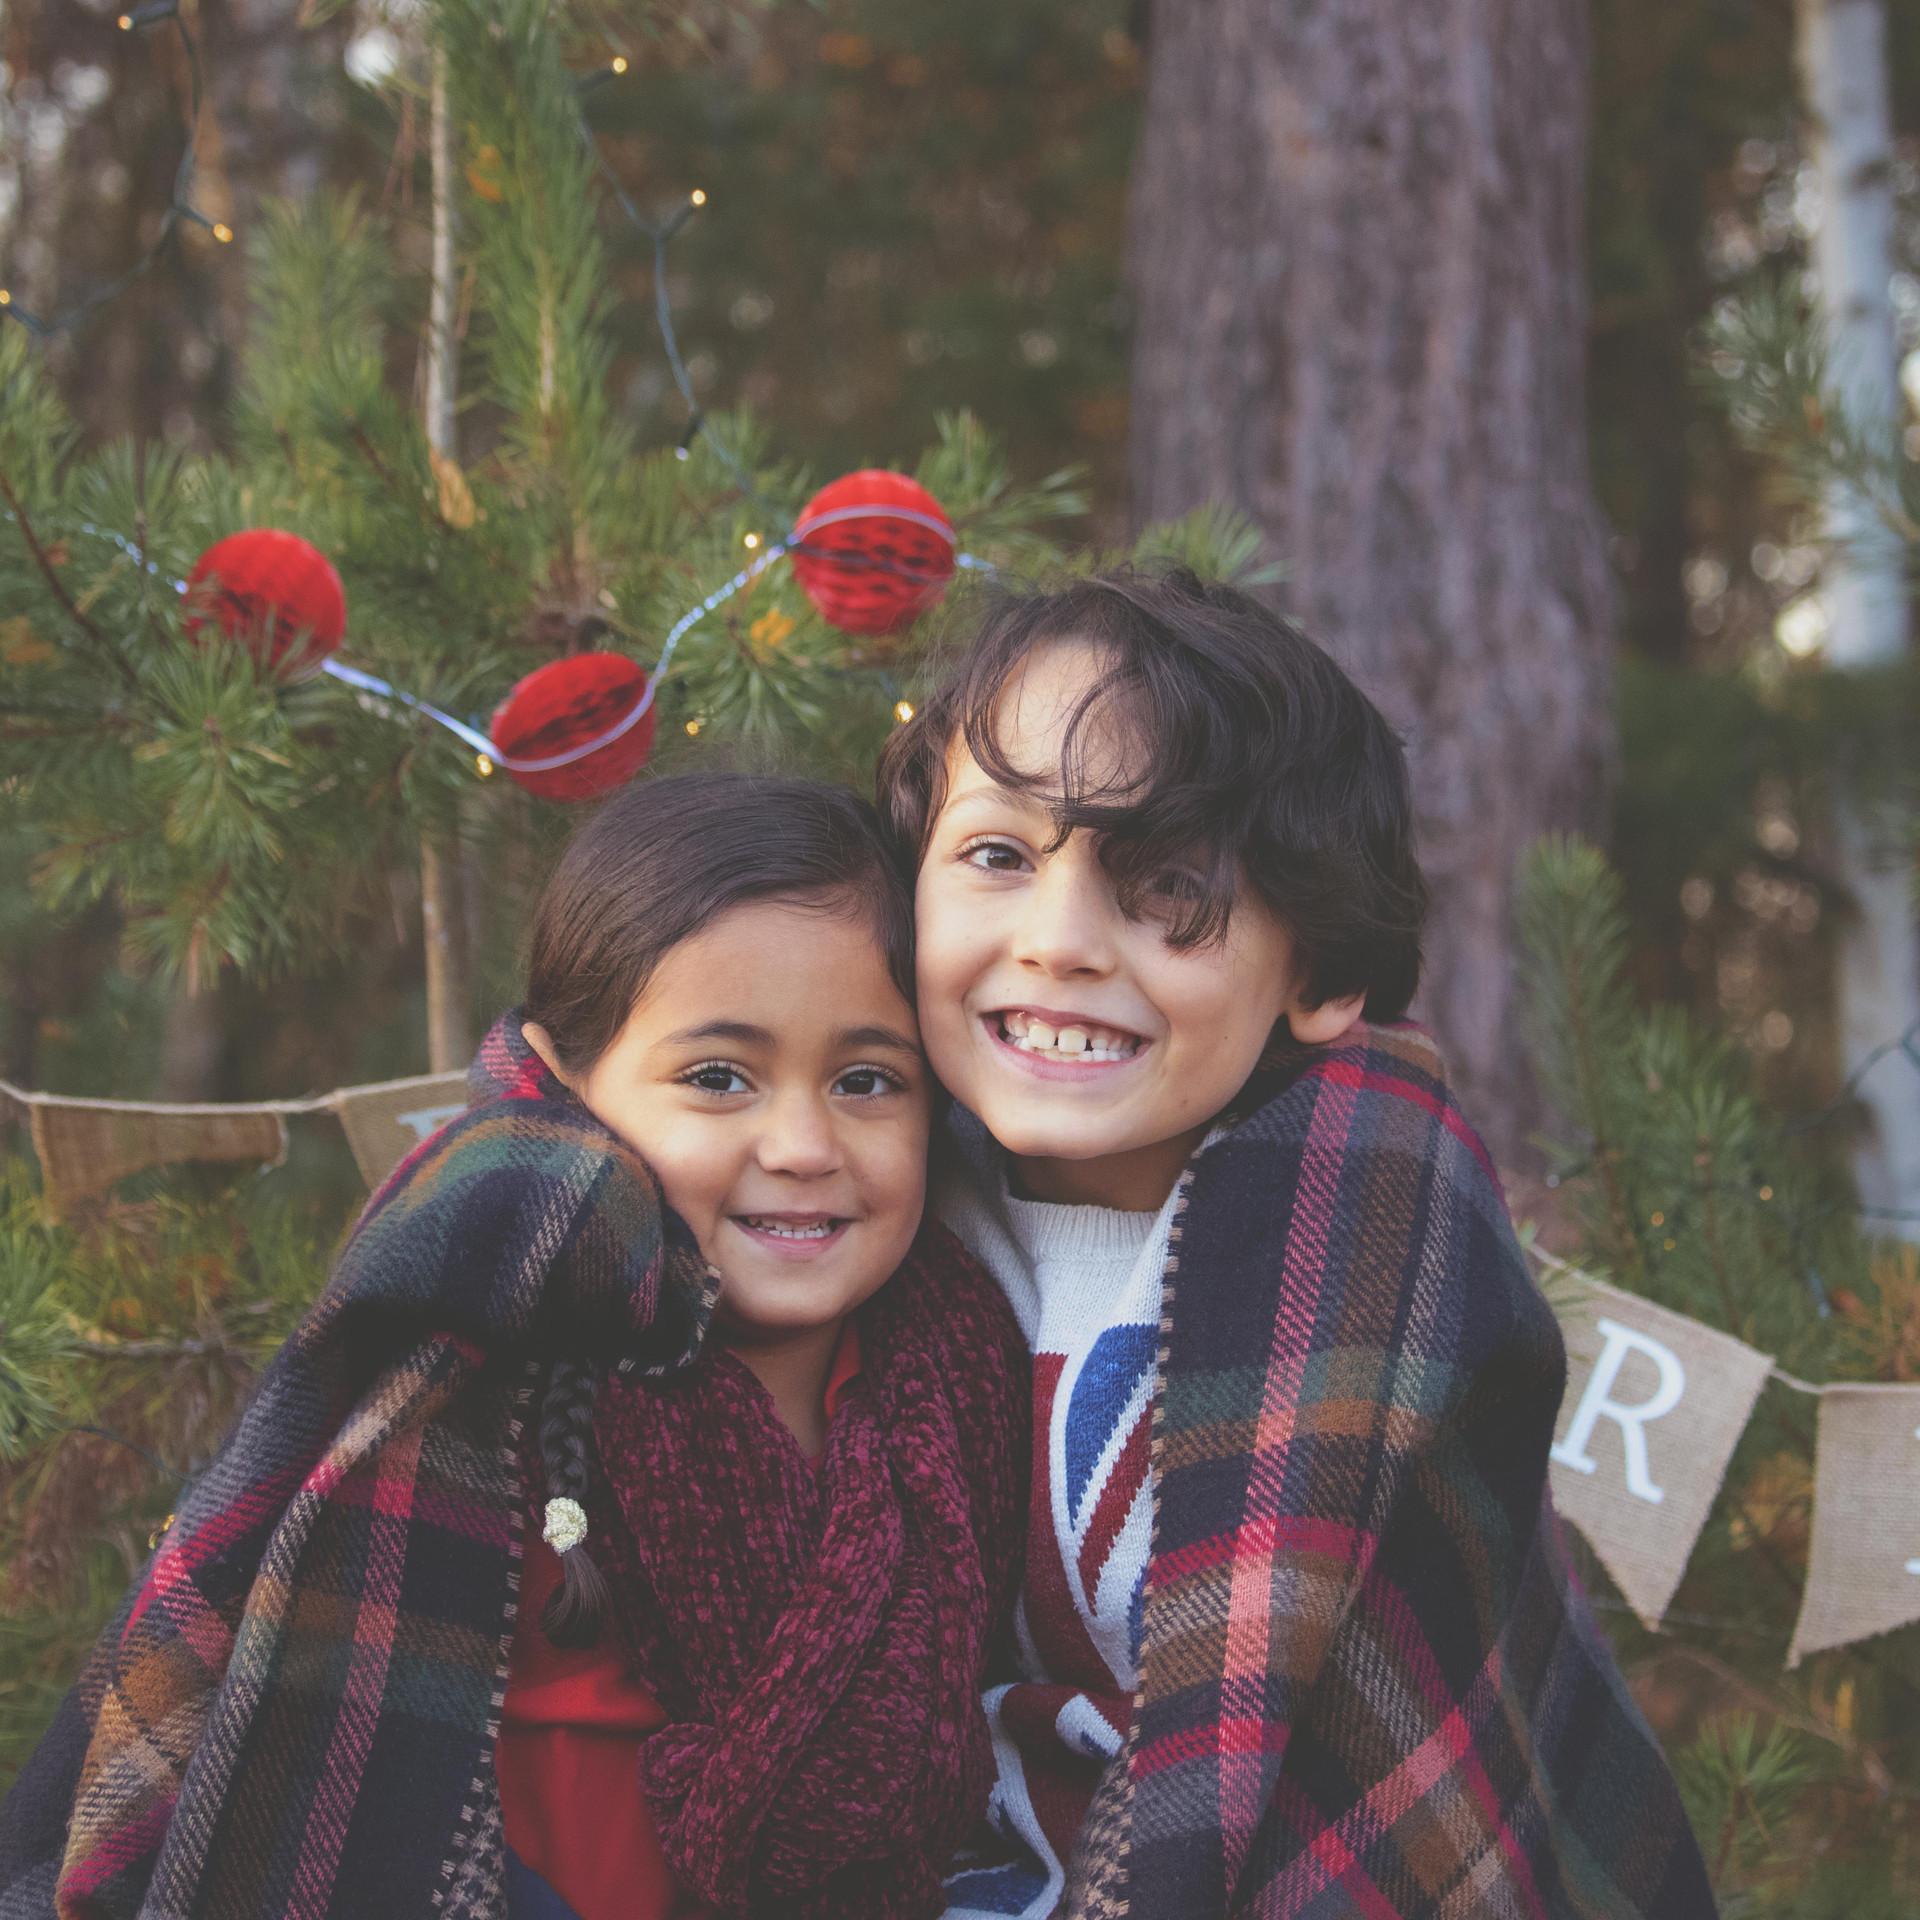 Fun Family Portraits at Christmas Time